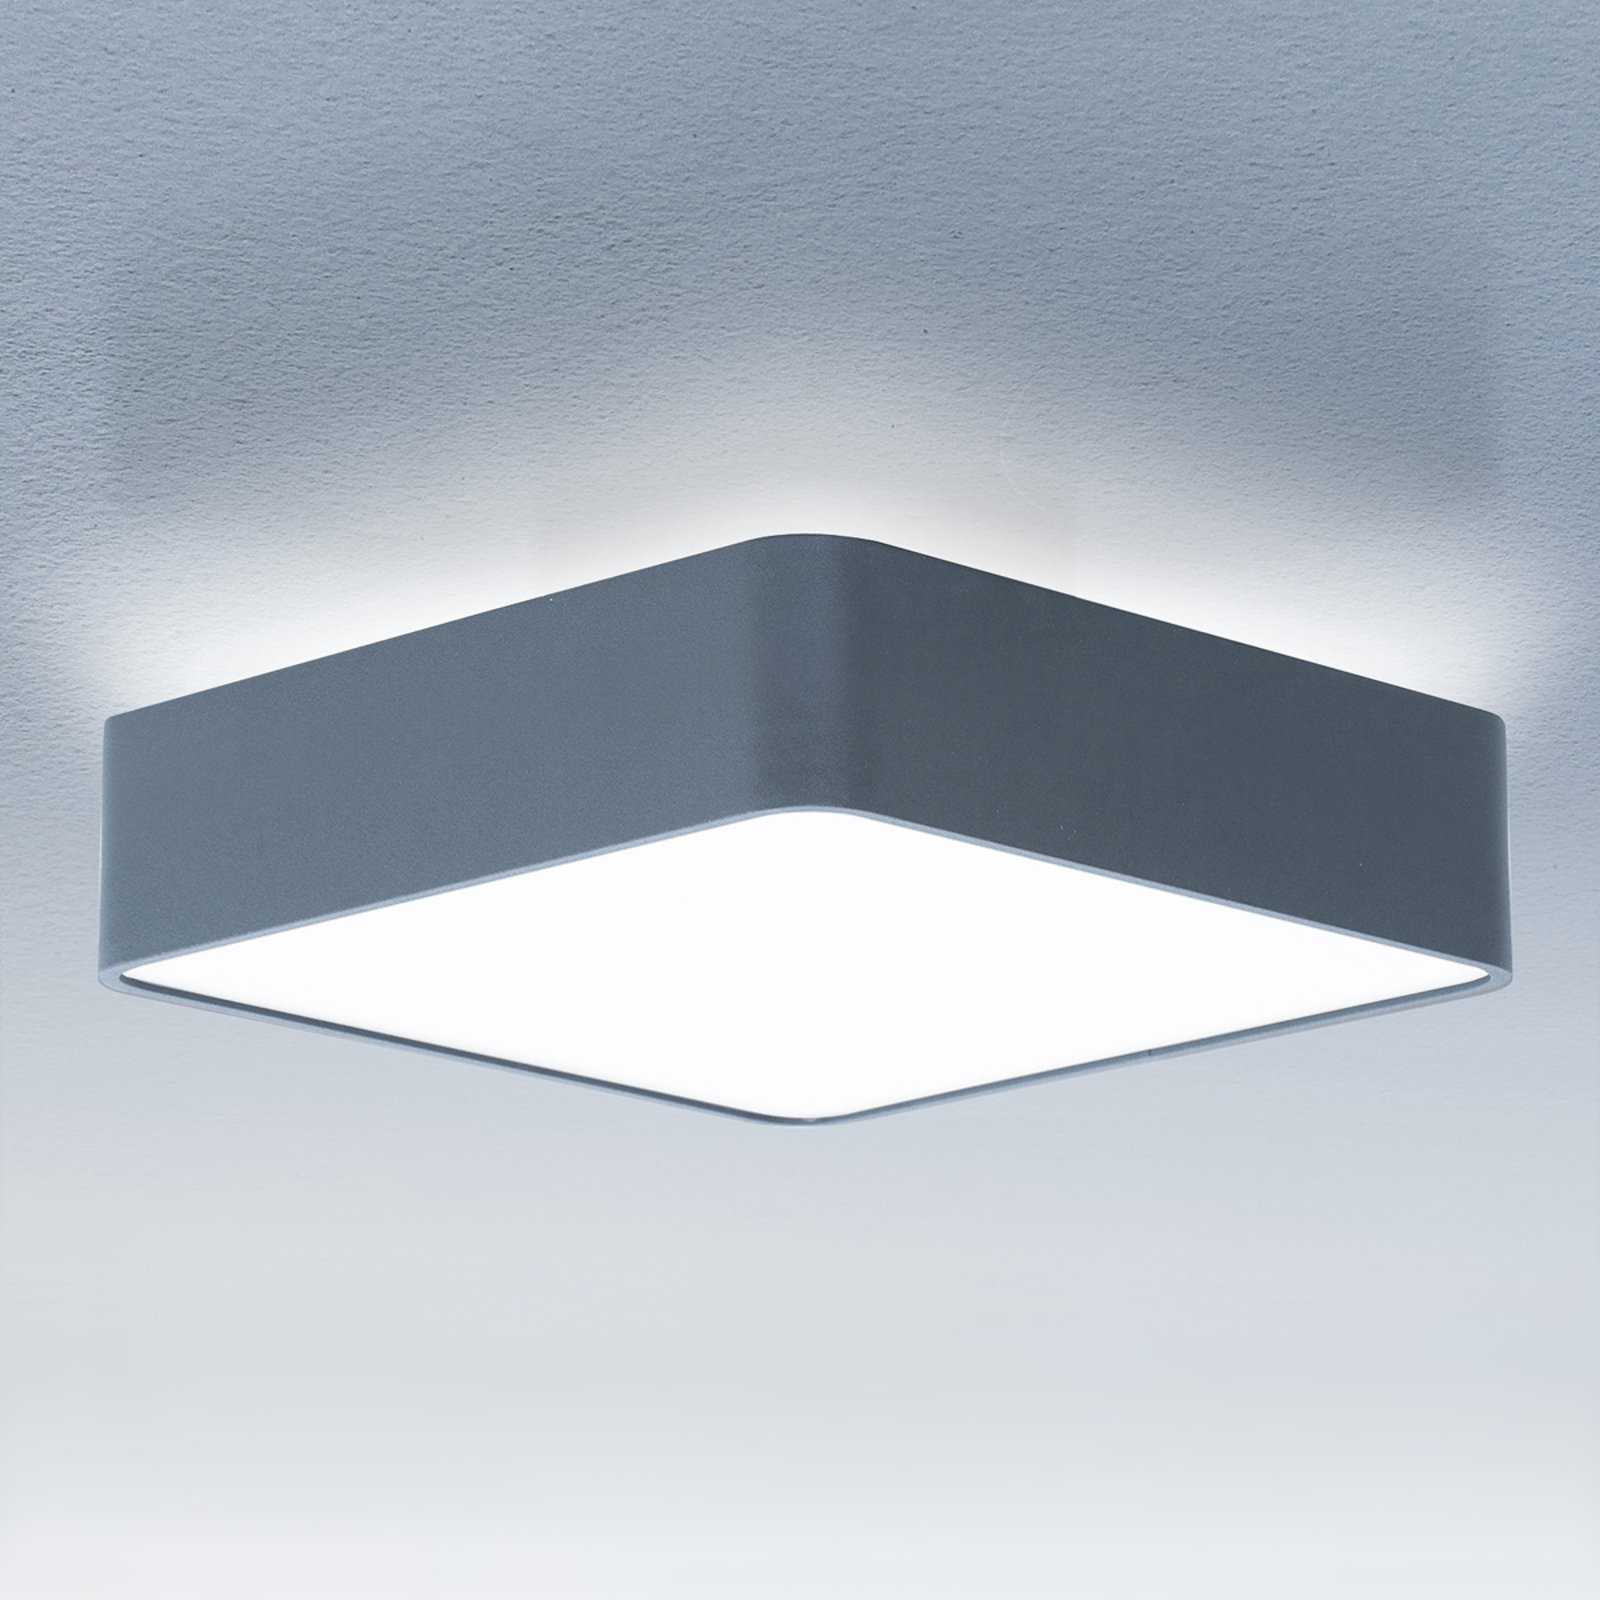 Caleo-X2 kvadr. taklampe LED univer.hvit 43 cm